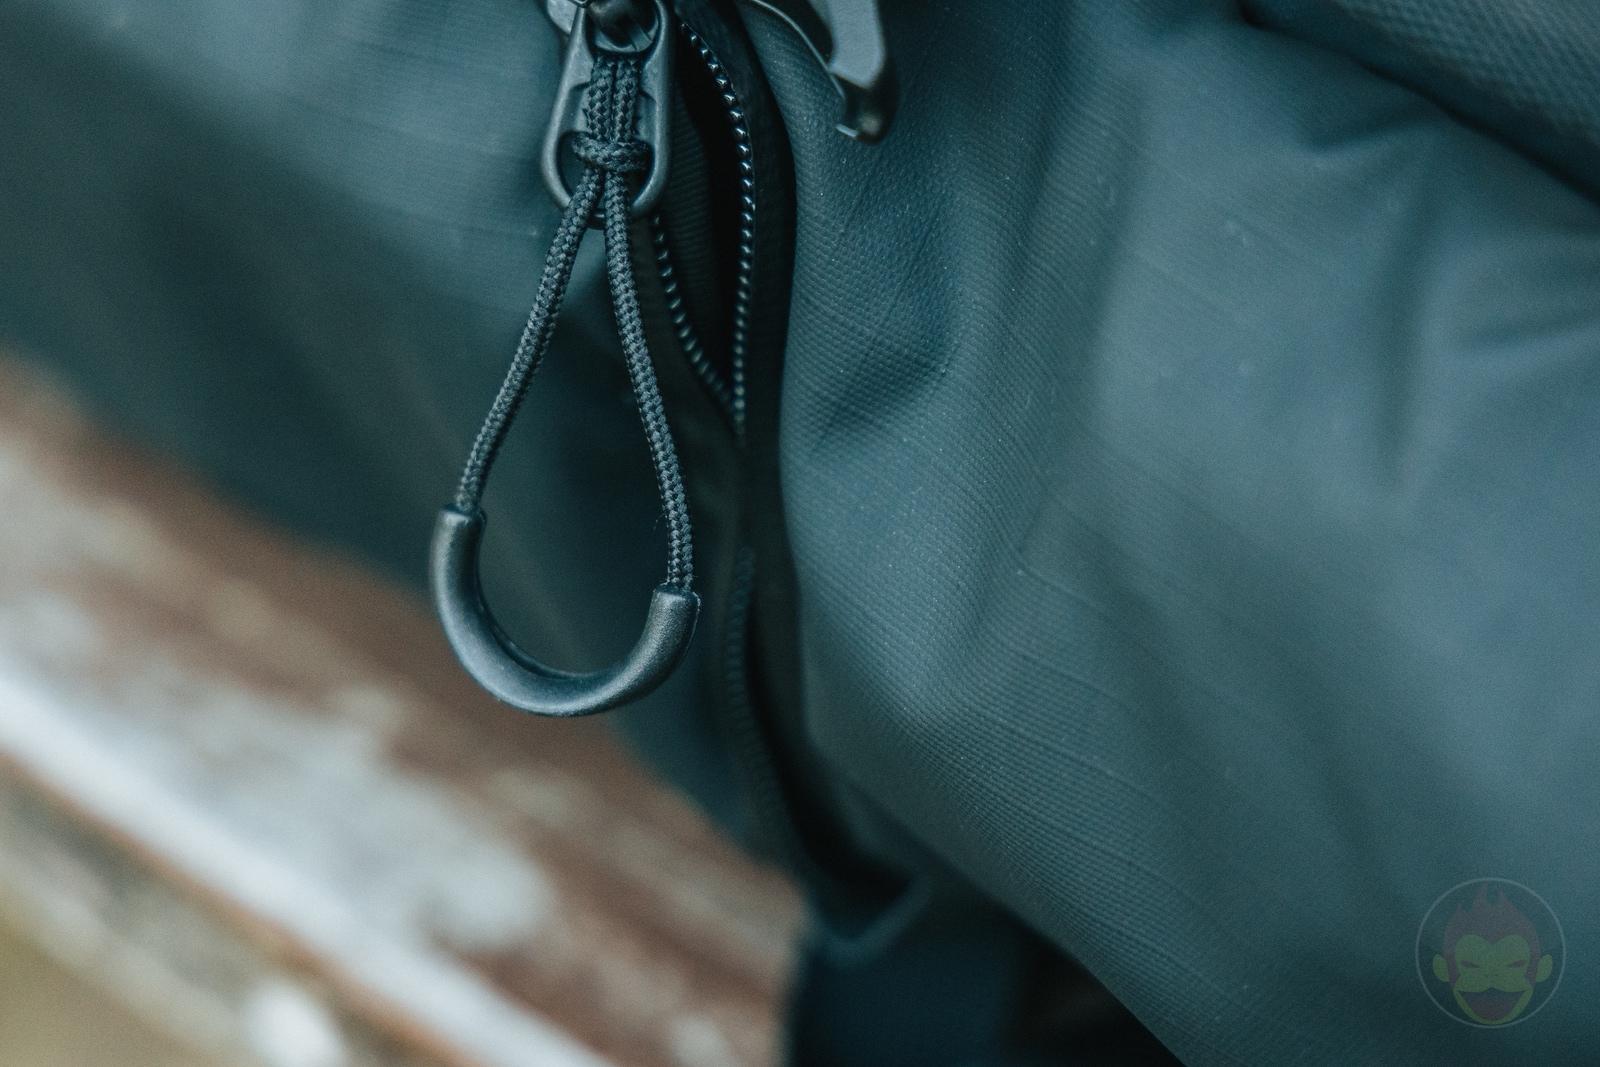 WANDRD FERNWEH Backpack Review 02